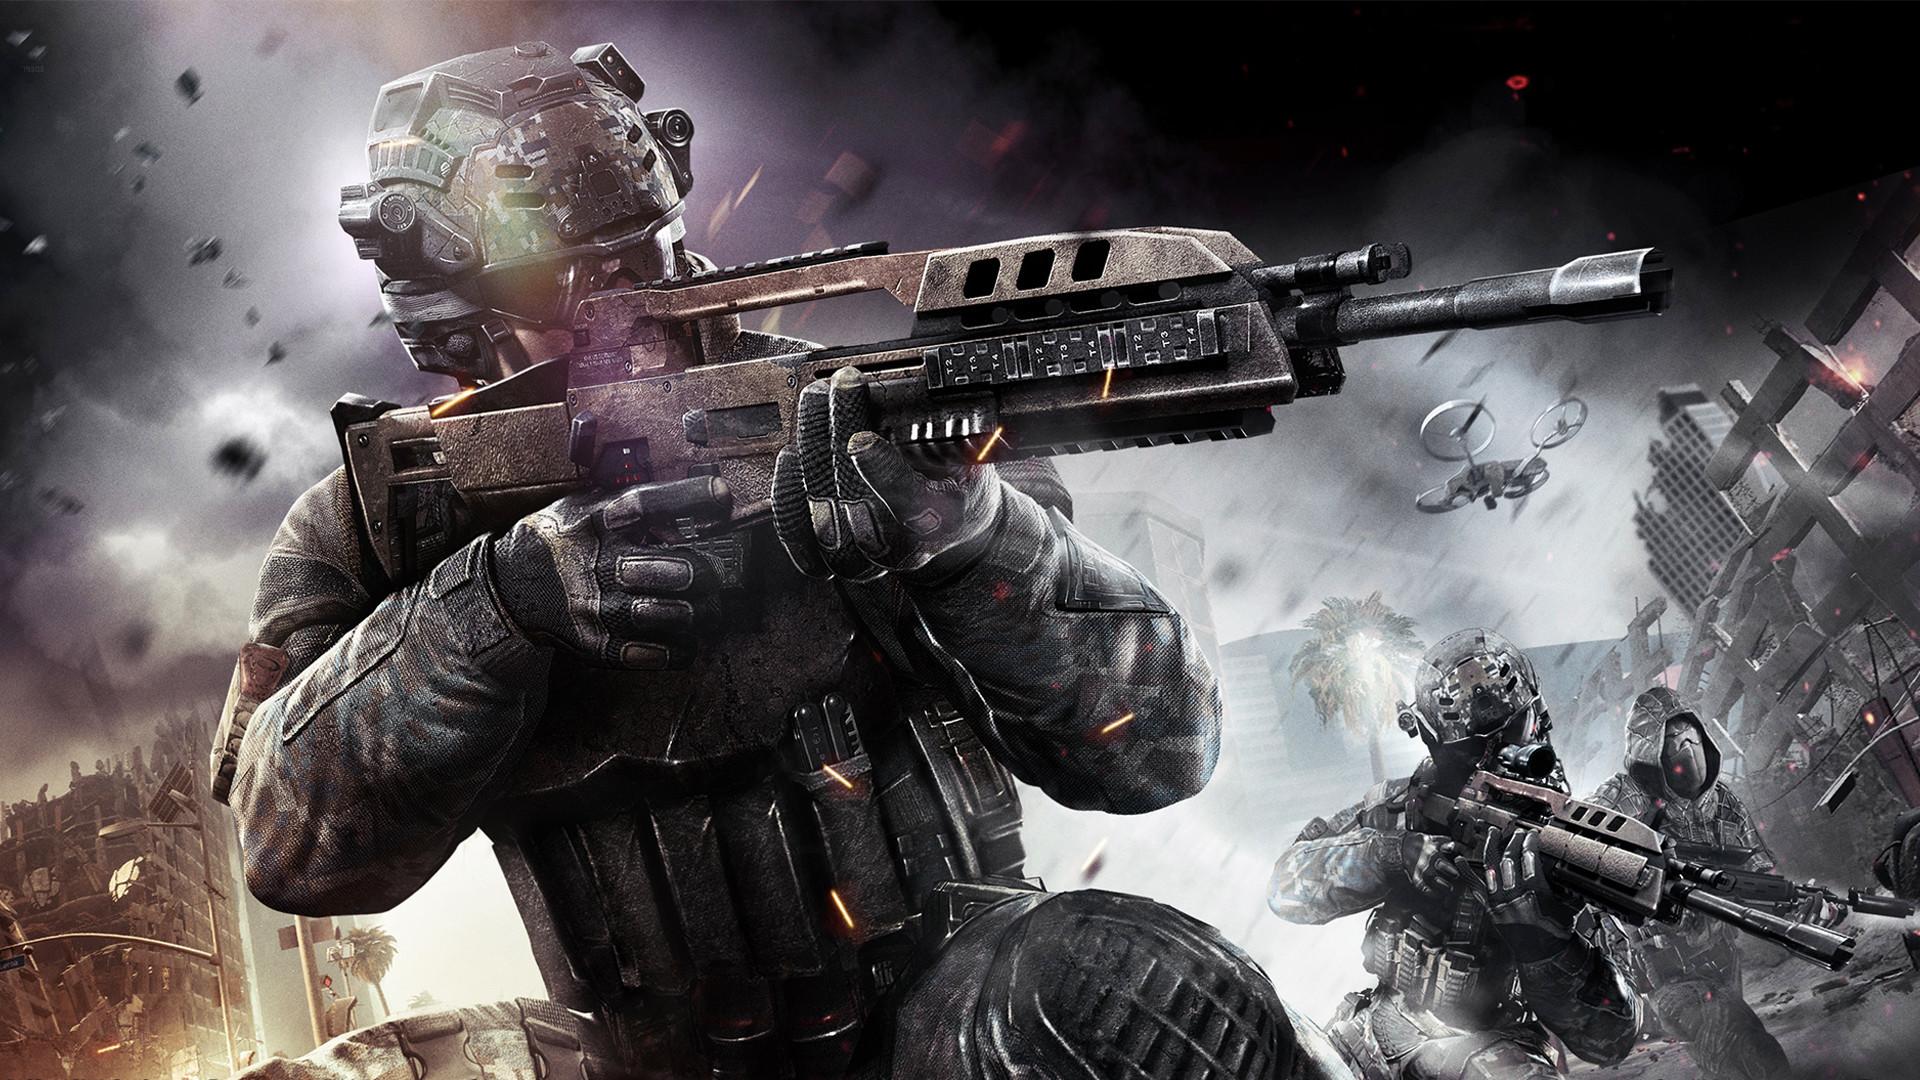 callofdutyblackopswallpaper Call of Duty Black Ops   HD Wallpapers    Pinterest   Black ops, Hd wallpaper and Zombie wallpaper